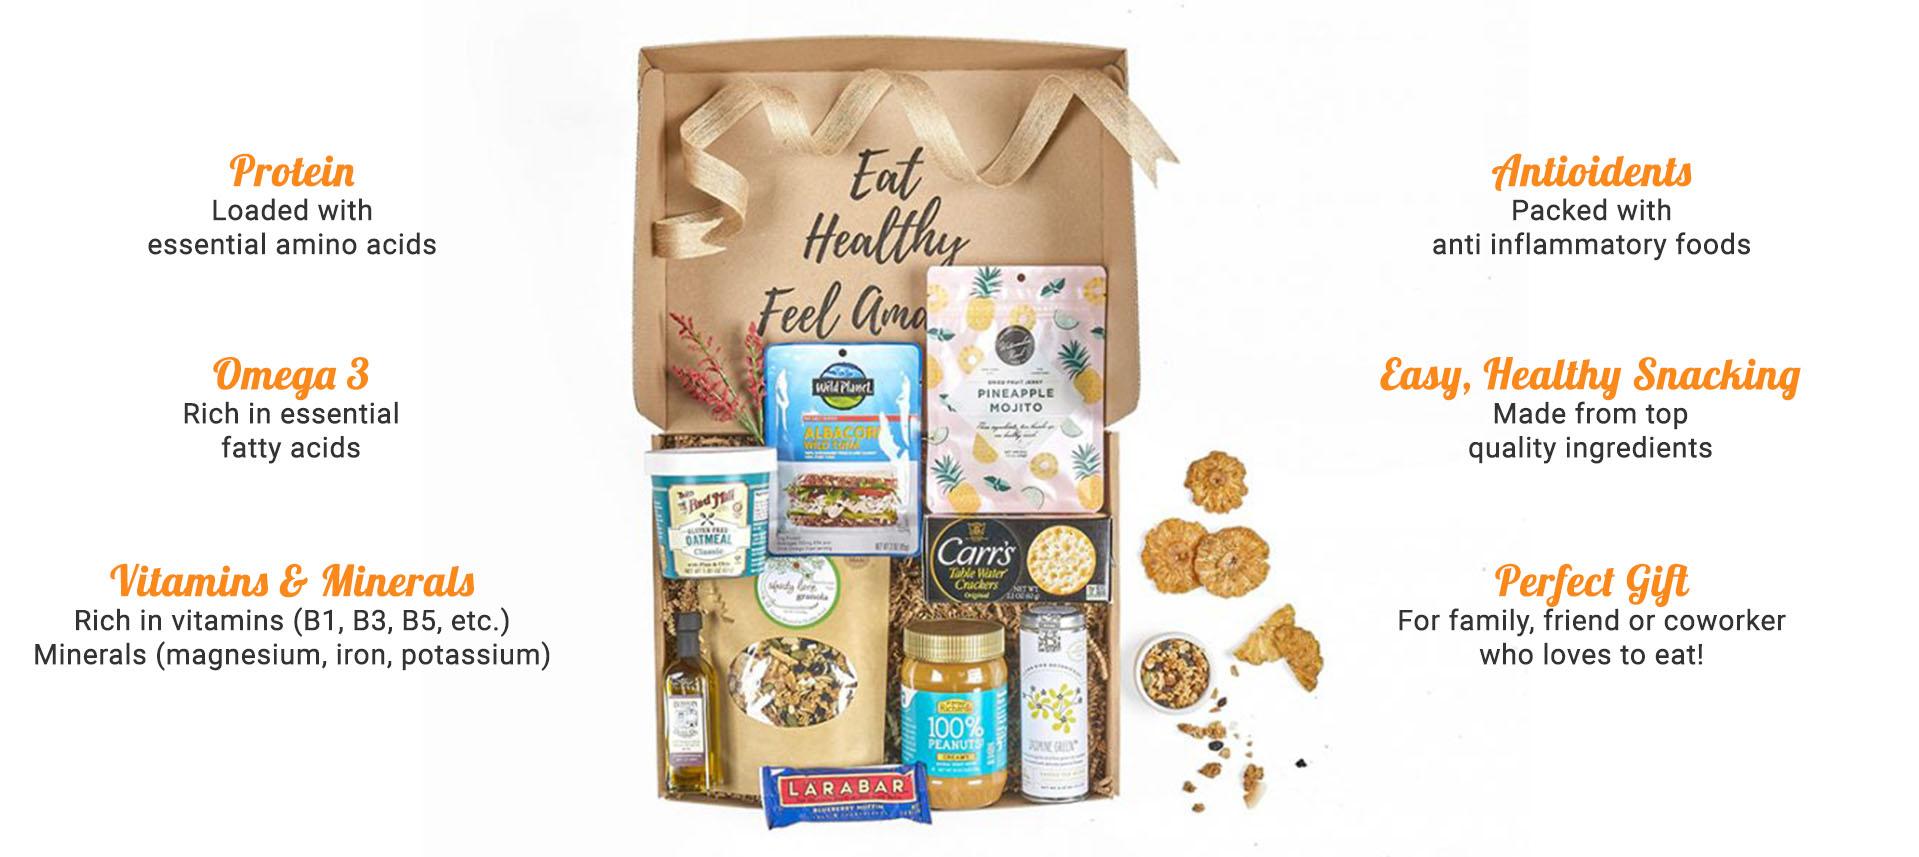 heart-healthy-food-gift-box